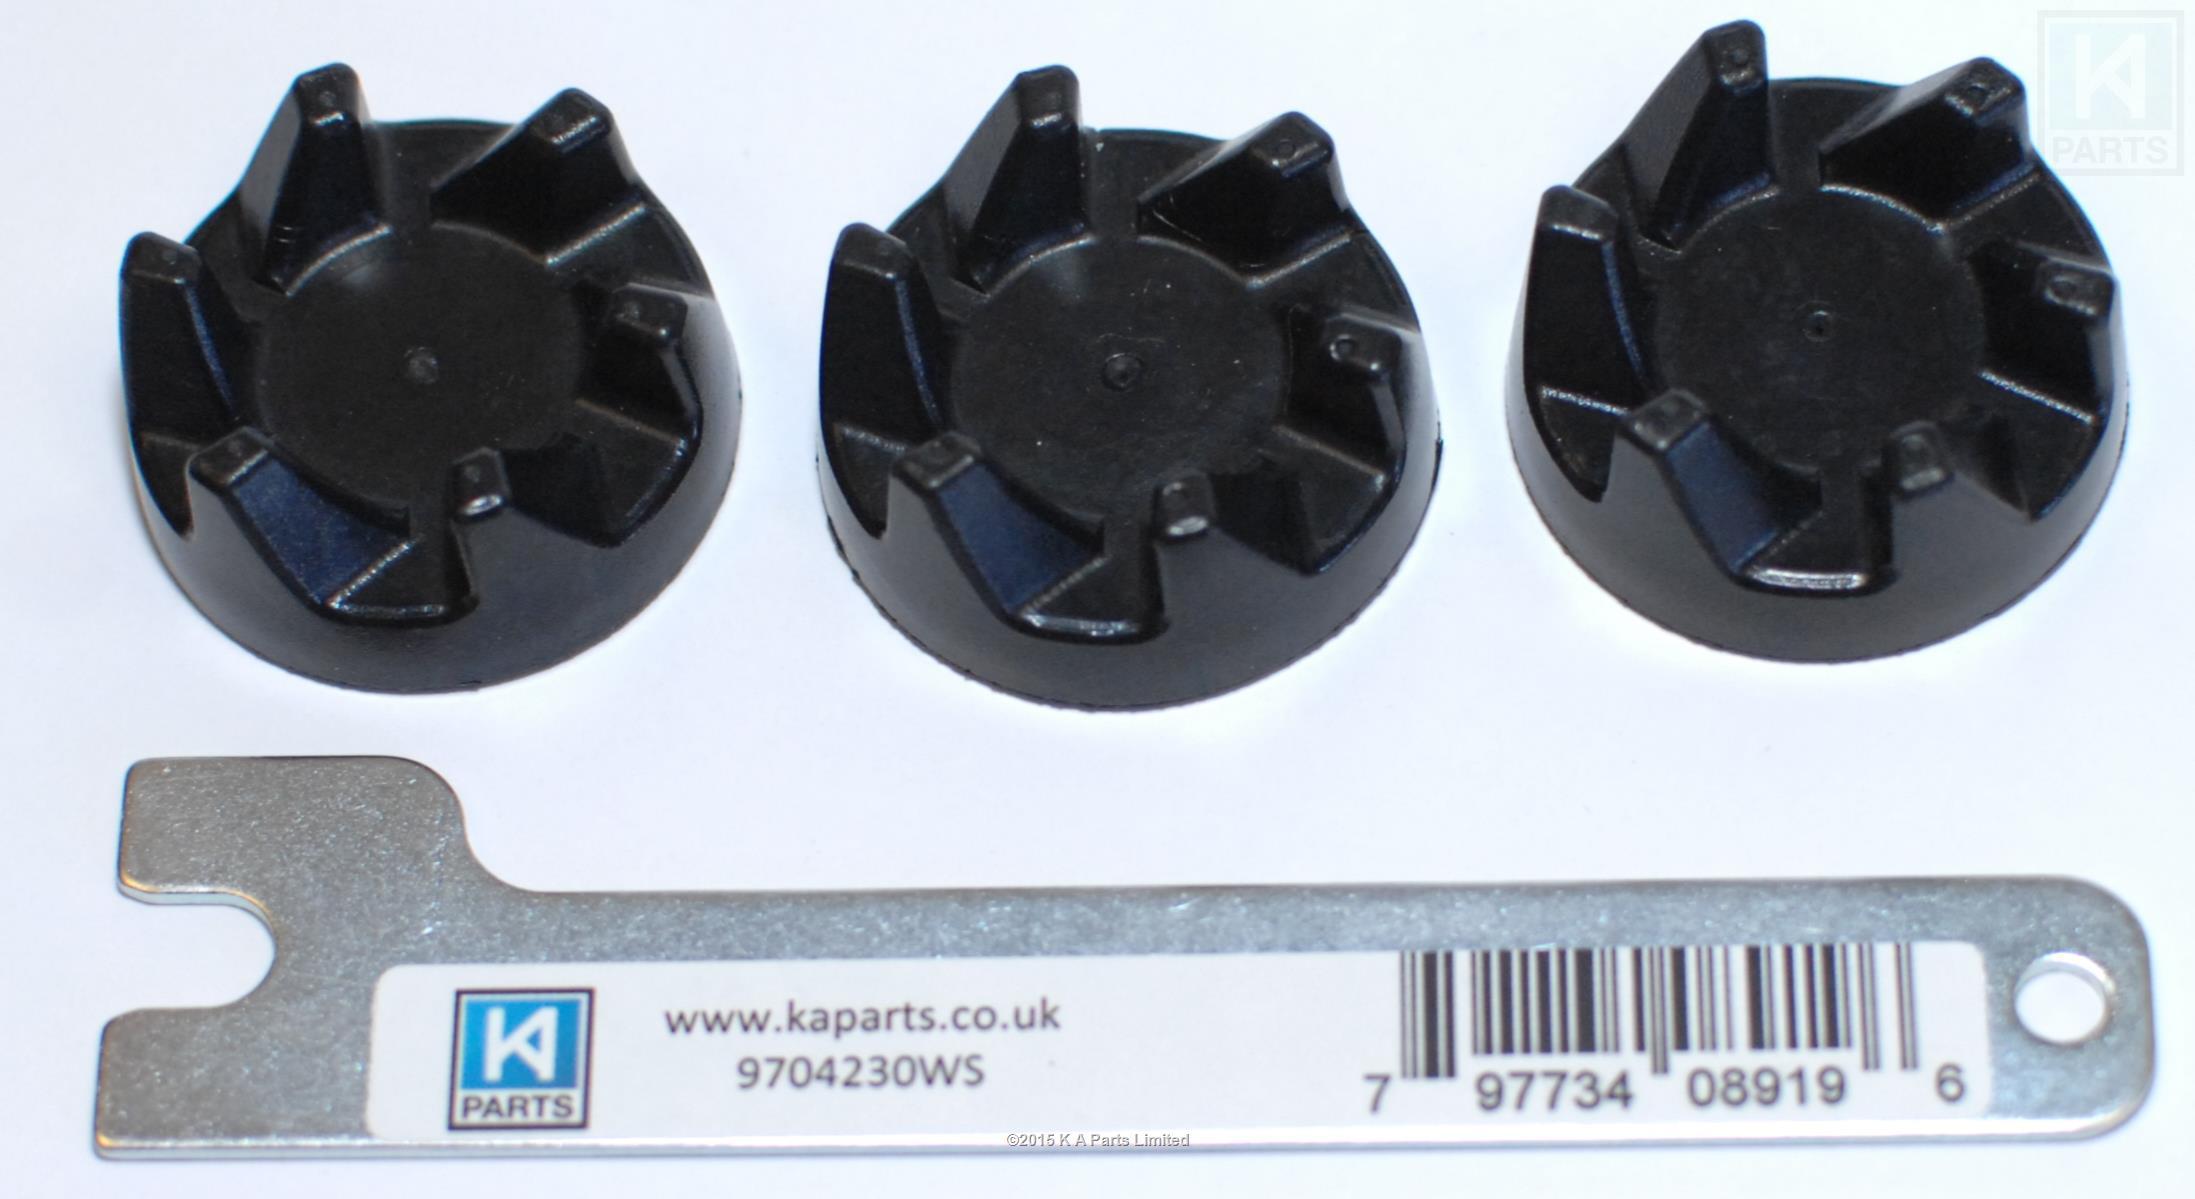 Kitchenaid 3 x rubber couplers and spanner for ksb5 and ksb52 blenders brand new ebay - Kitchenaid blender parts uk ...